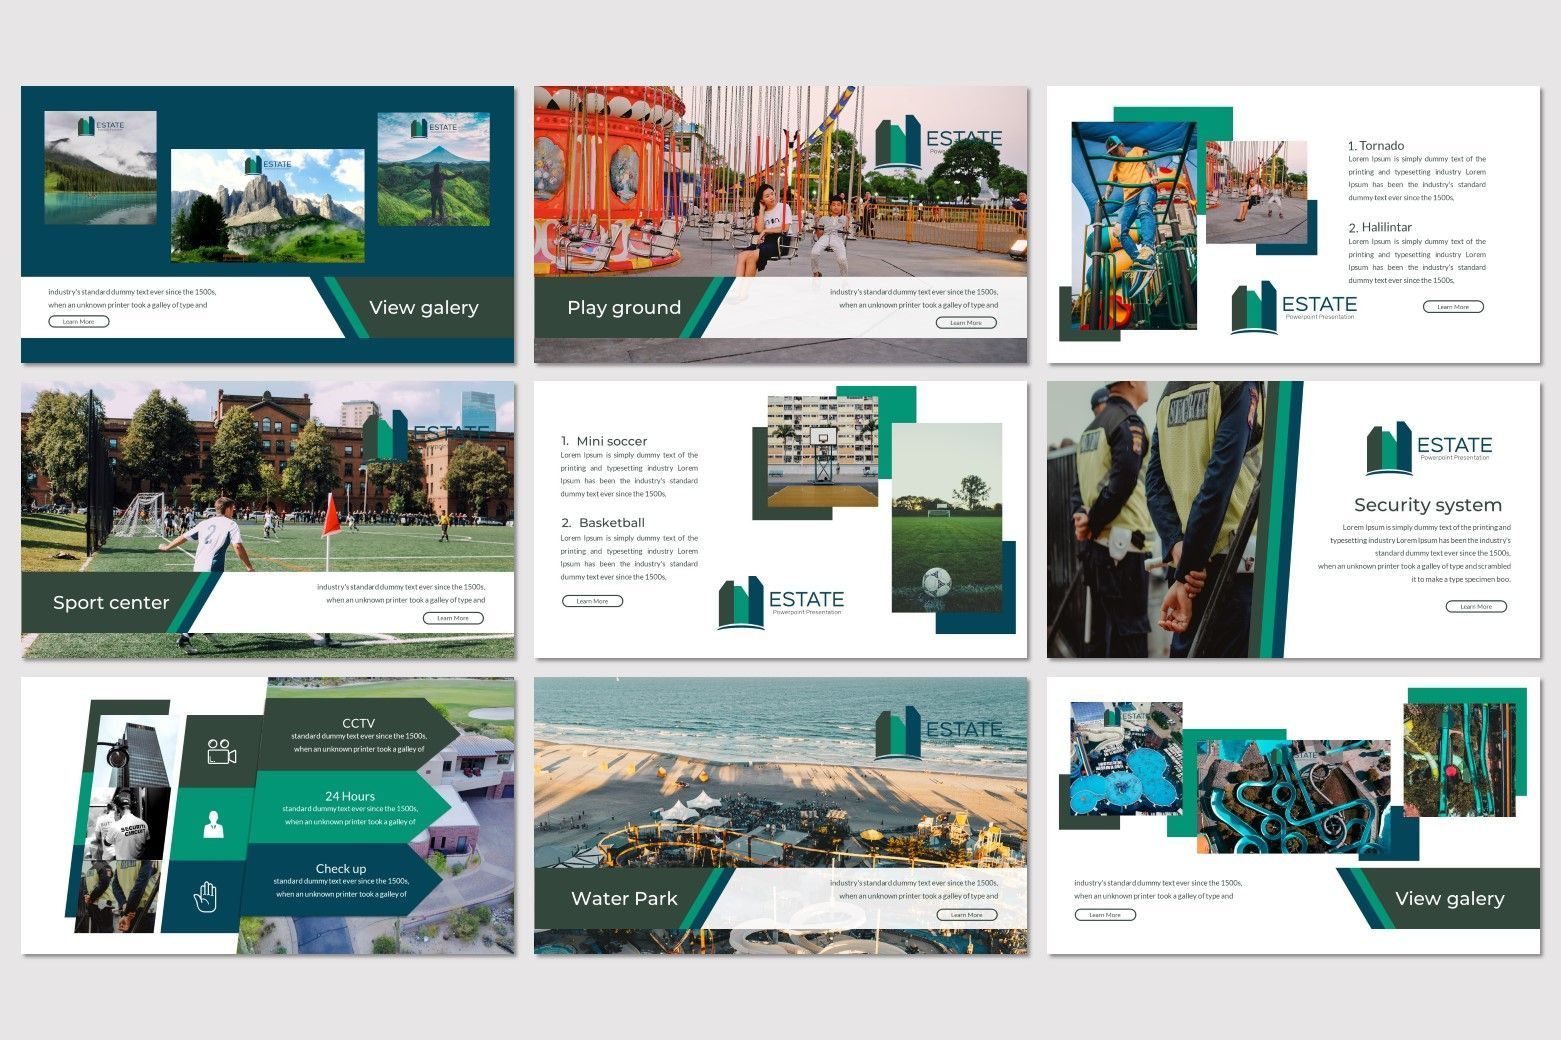 Estate - Google Slides Theme, Slide 3, 07175, Presentation Templates — PoweredTemplate.com